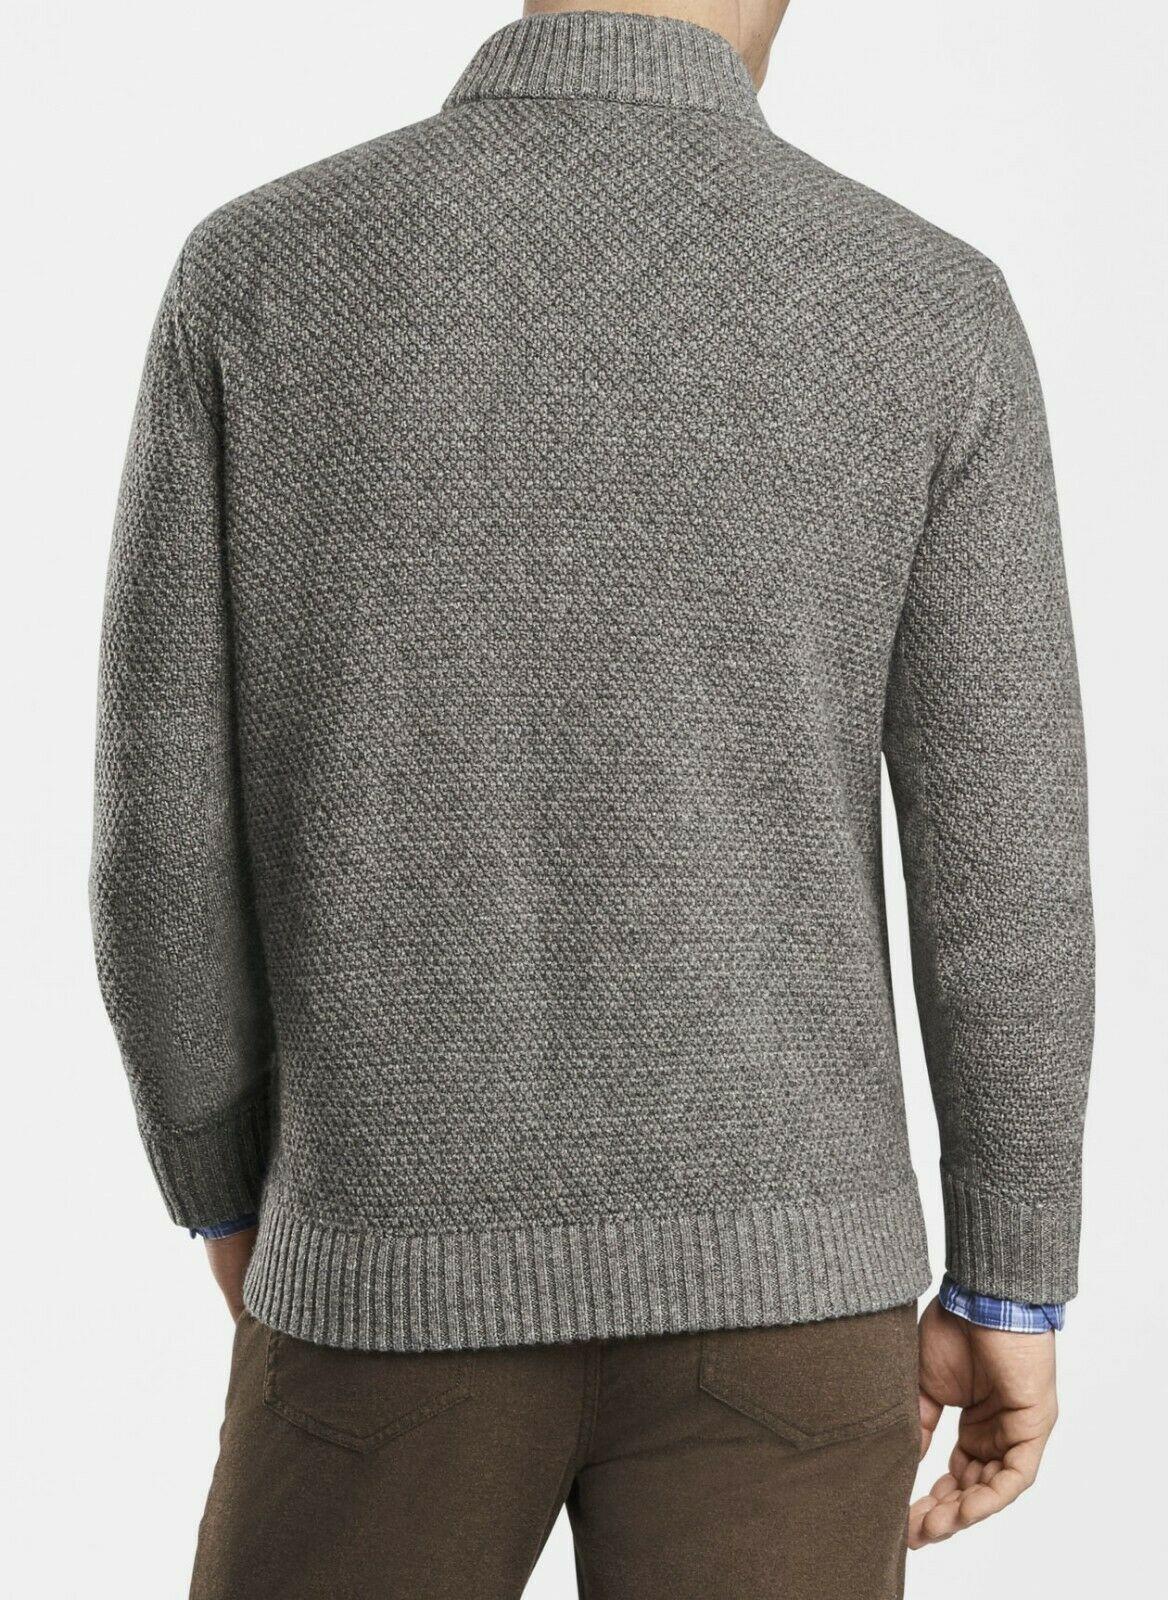 Peter Millar Mens Sweater Gray Size Small S Button Zip Cardigan Wool